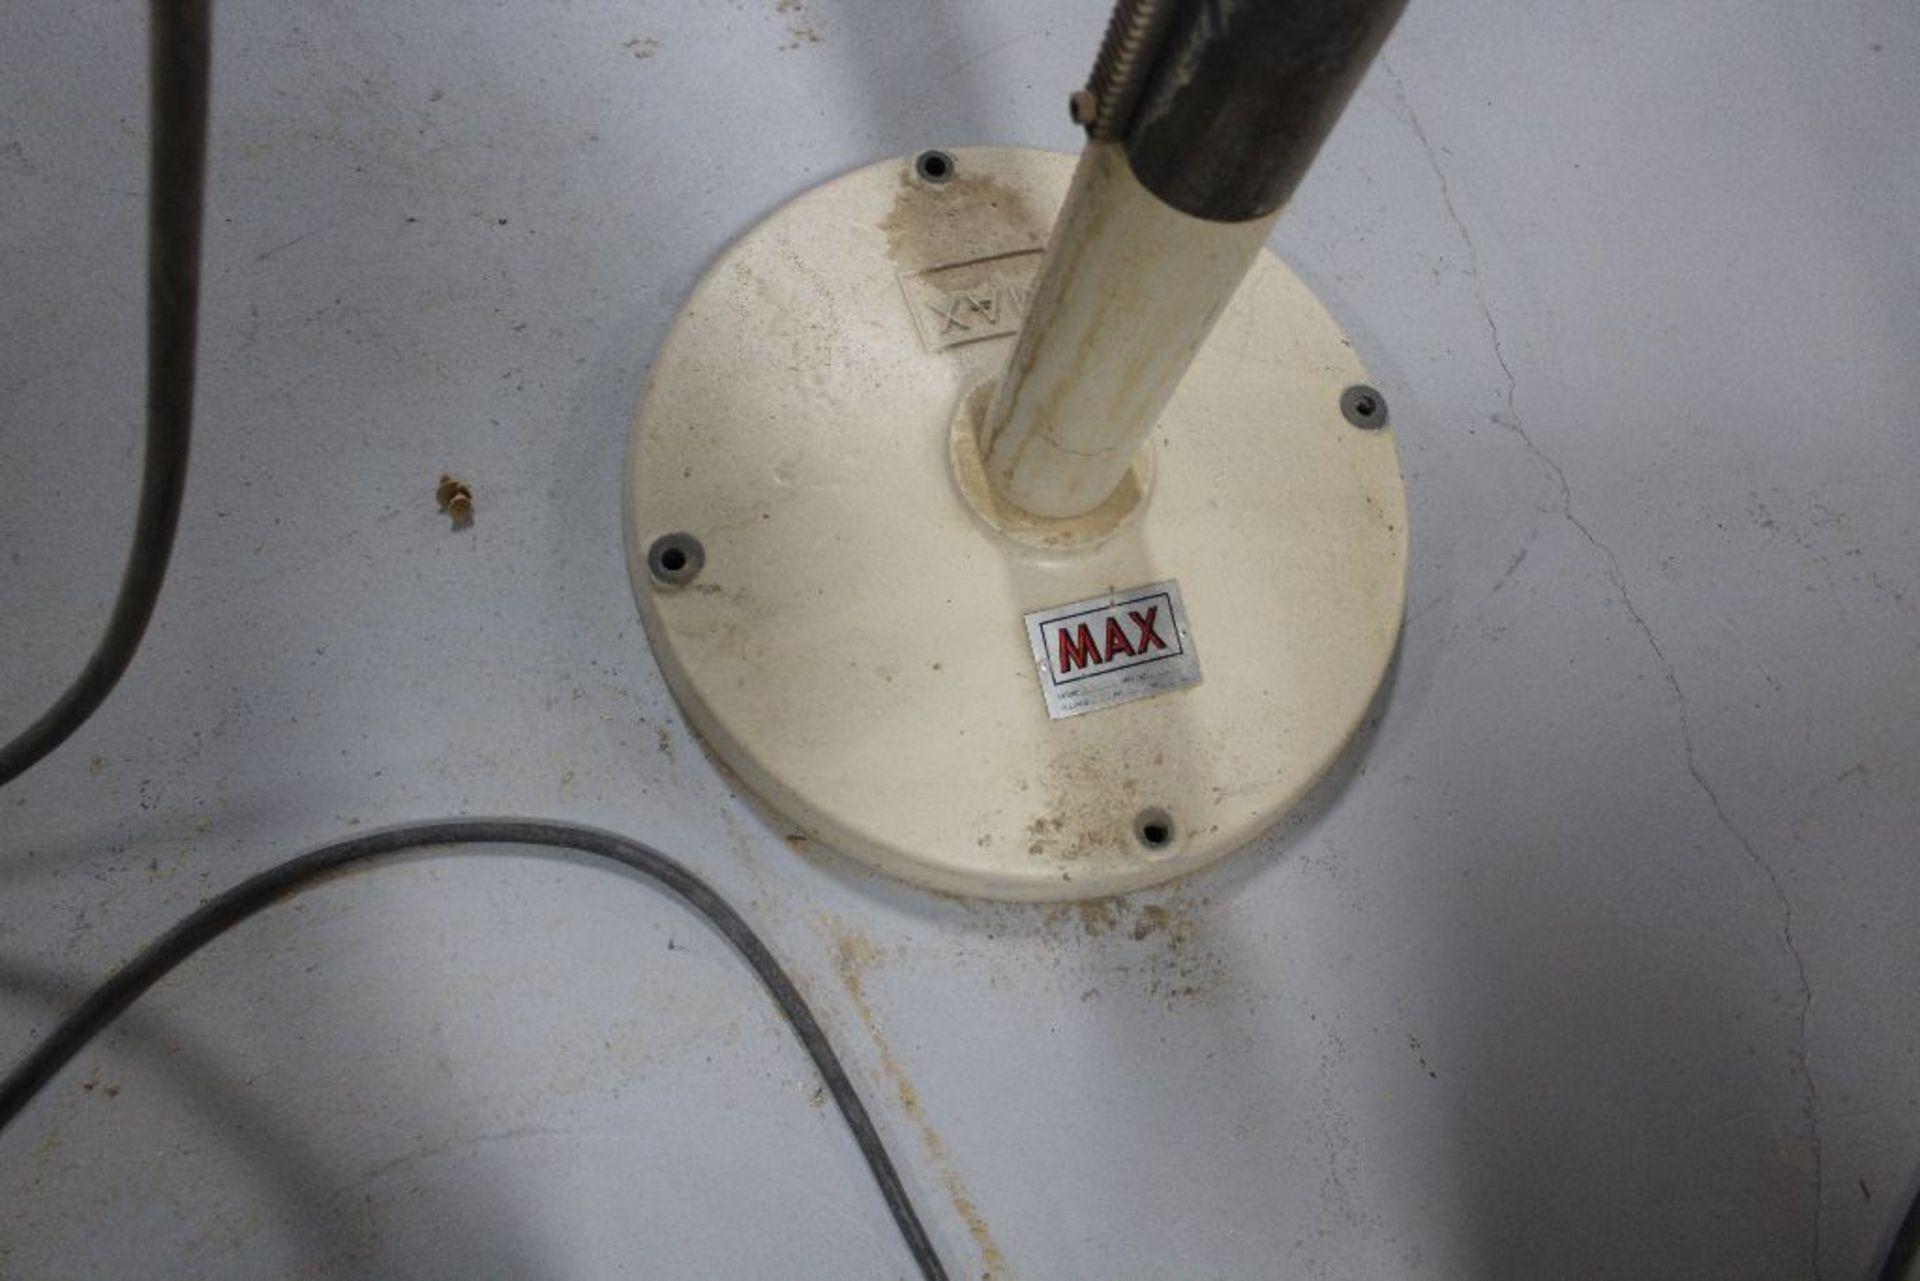 "Lot 021 - Max 18"" disk sander, model 18SD, sn 94349, 460 volts, 1 1/2 hp.,"